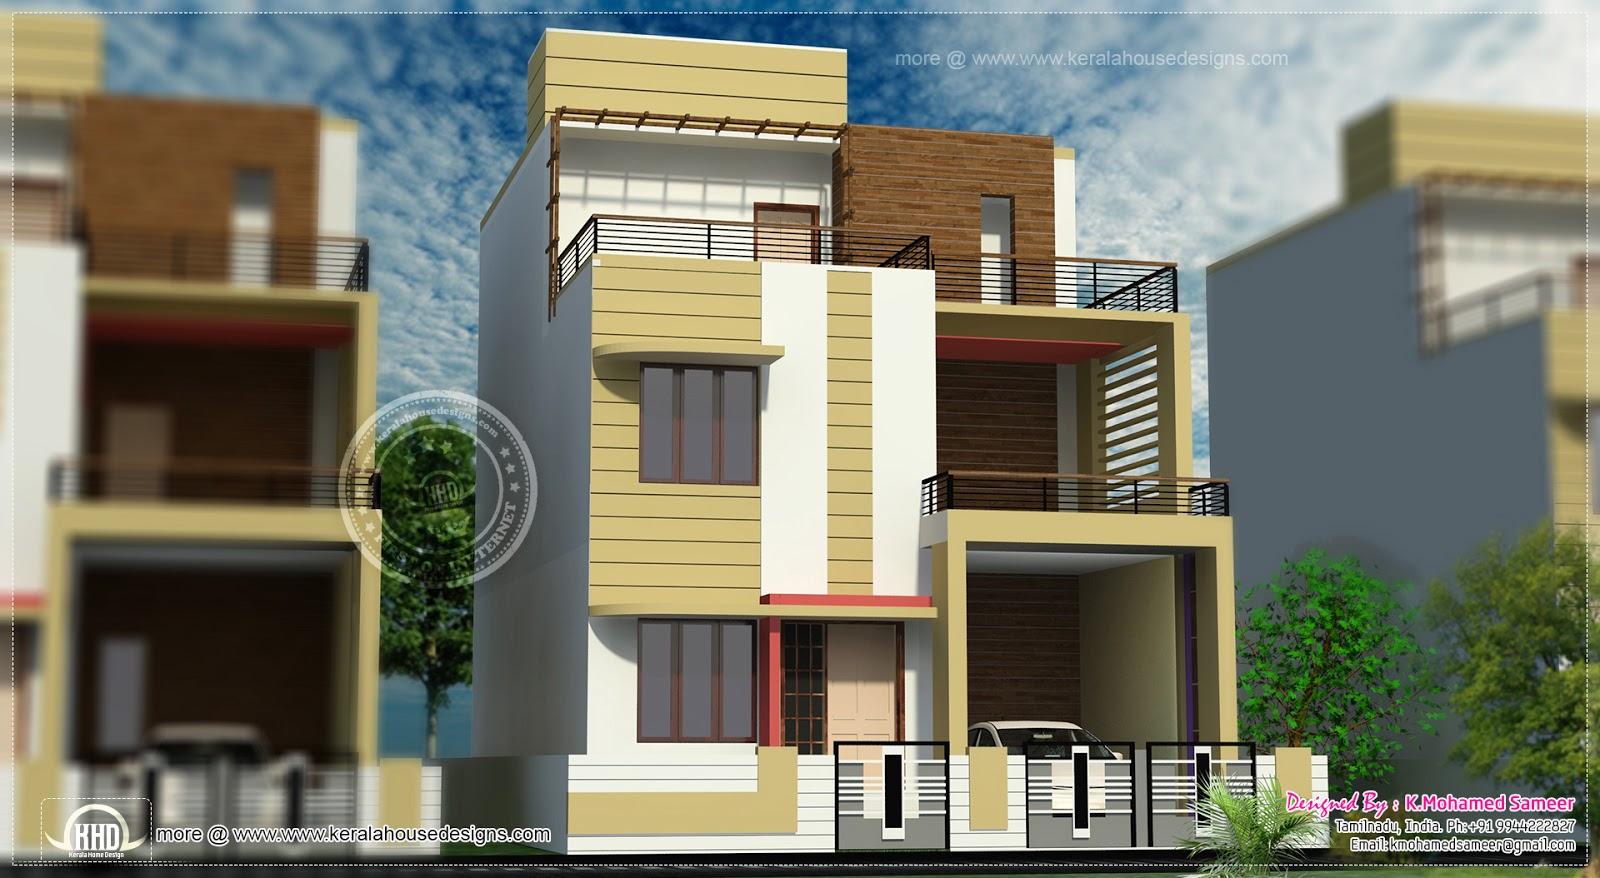 3 story house plan design in 2626 sq.feet - Kerala home ...